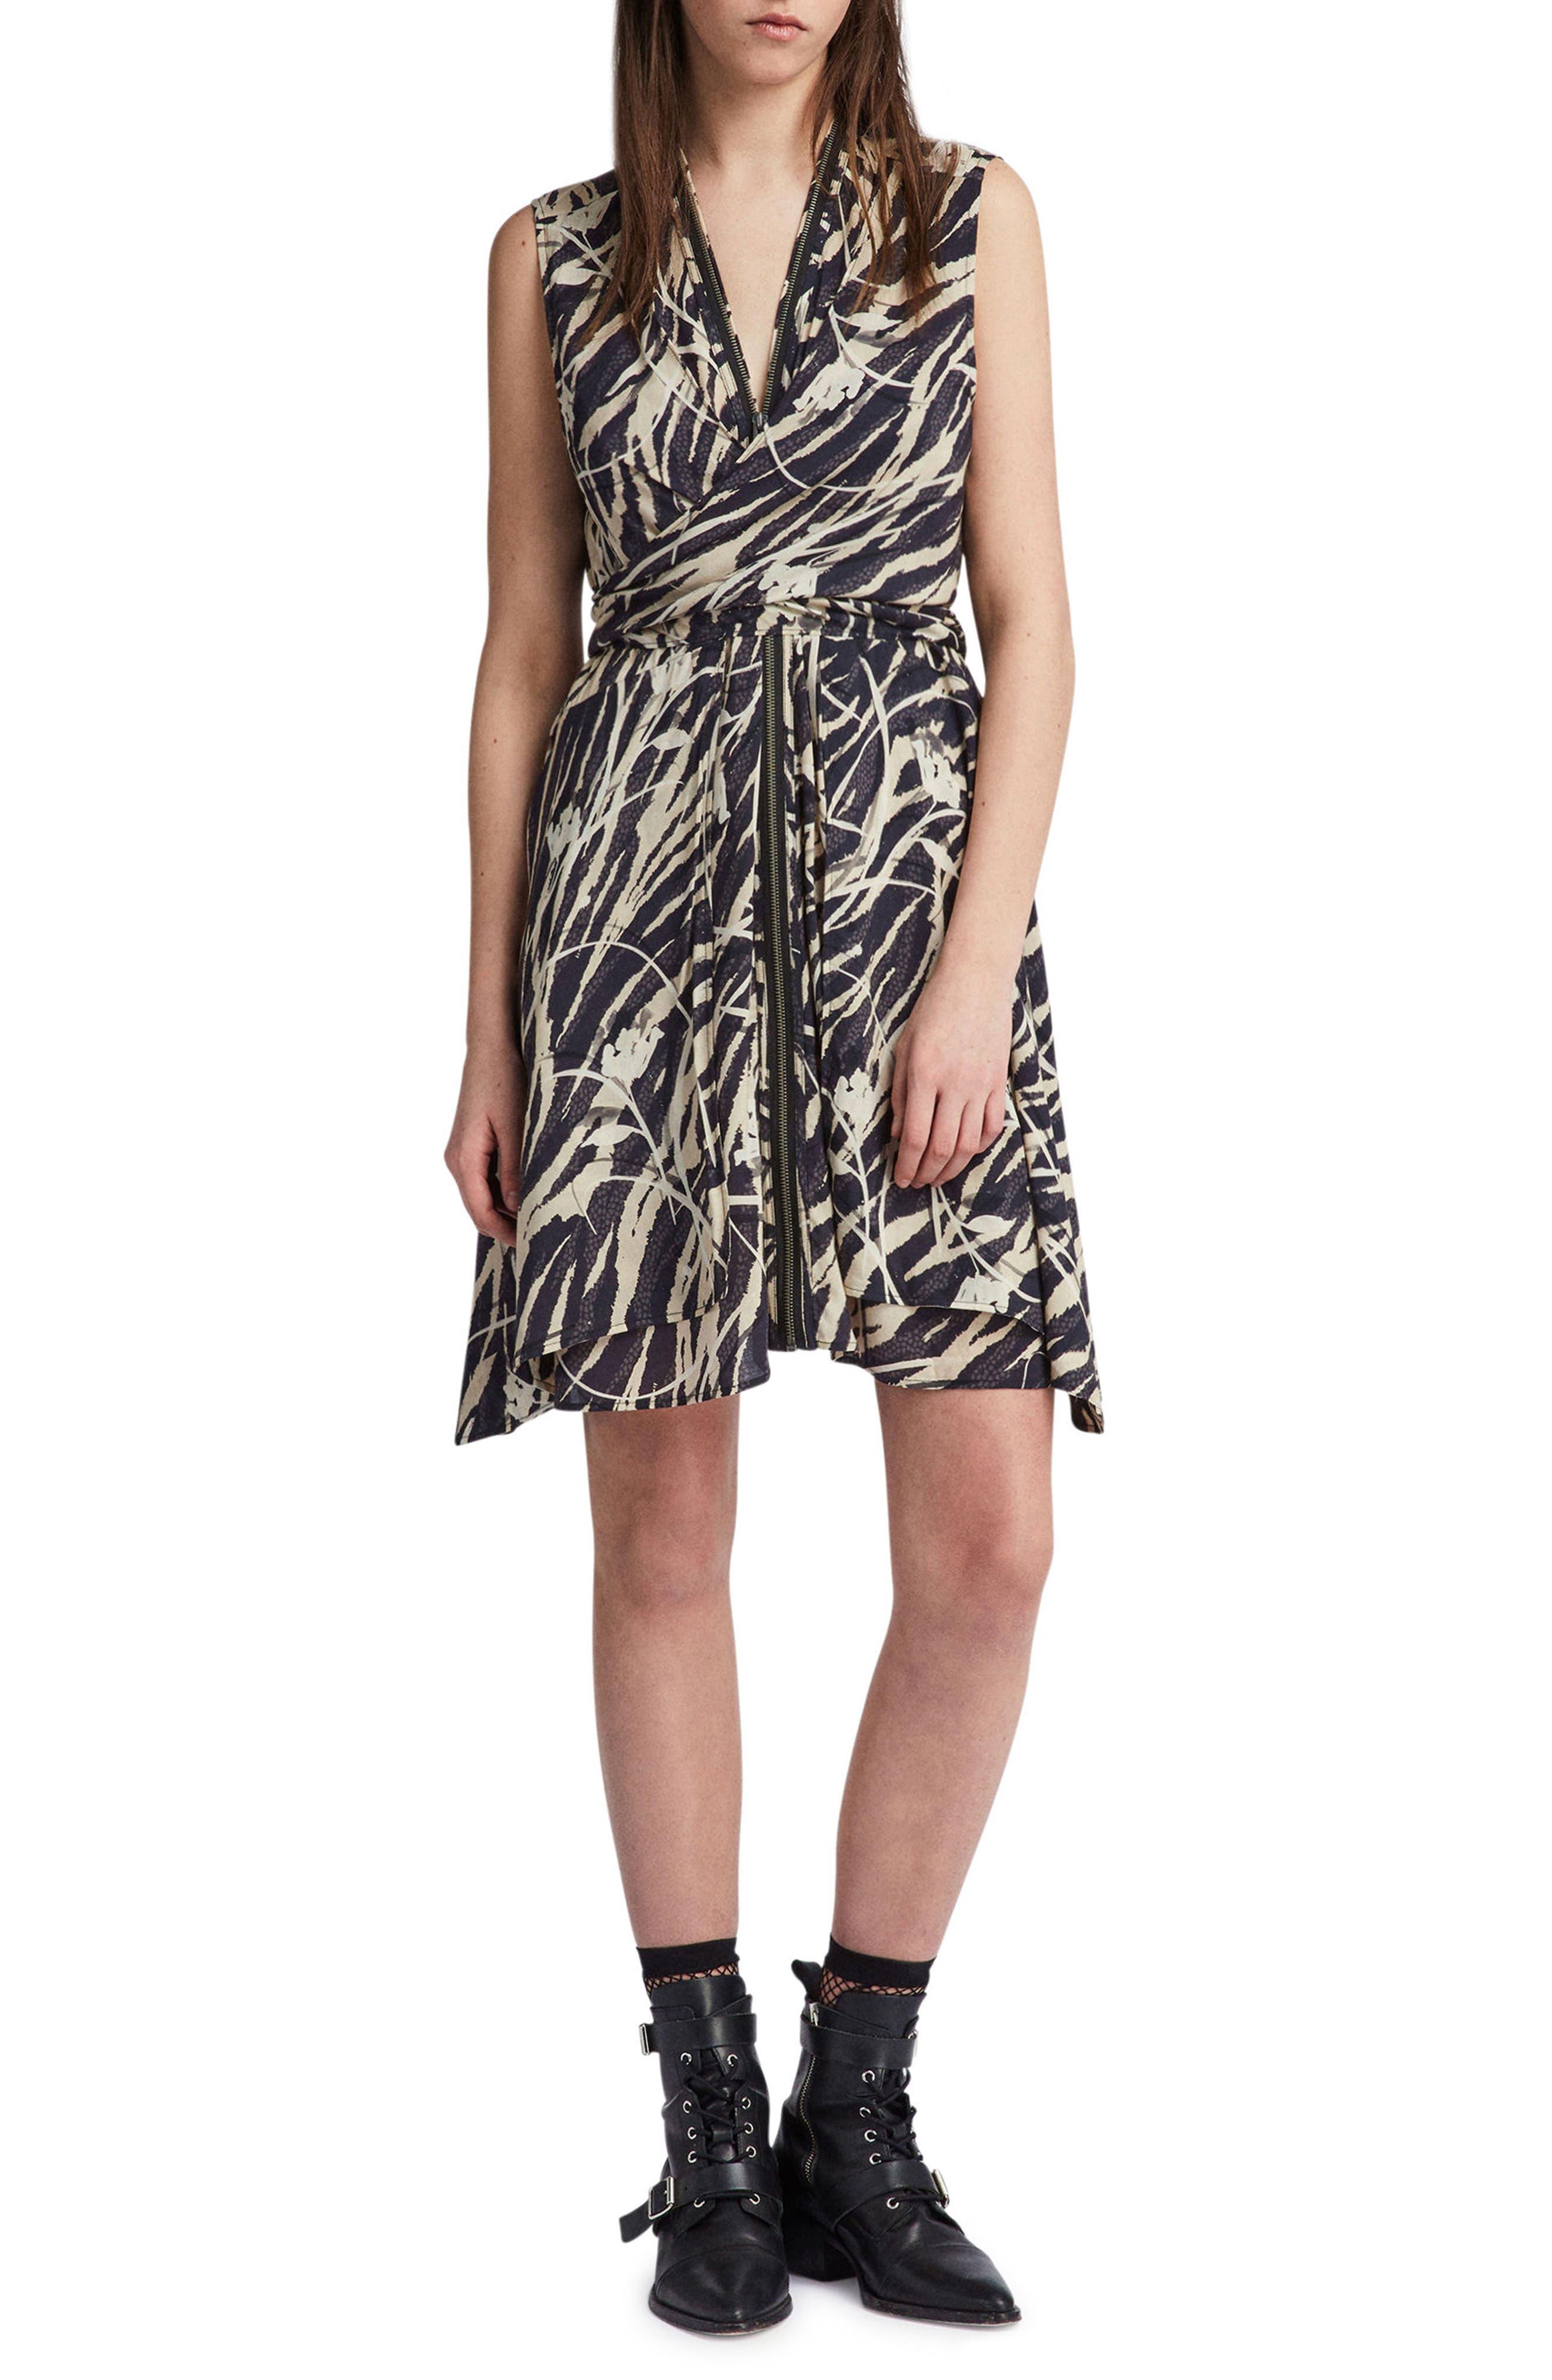 Jayda Katoi Dress,                             Main thumbnail 1, color,                             Coal Black